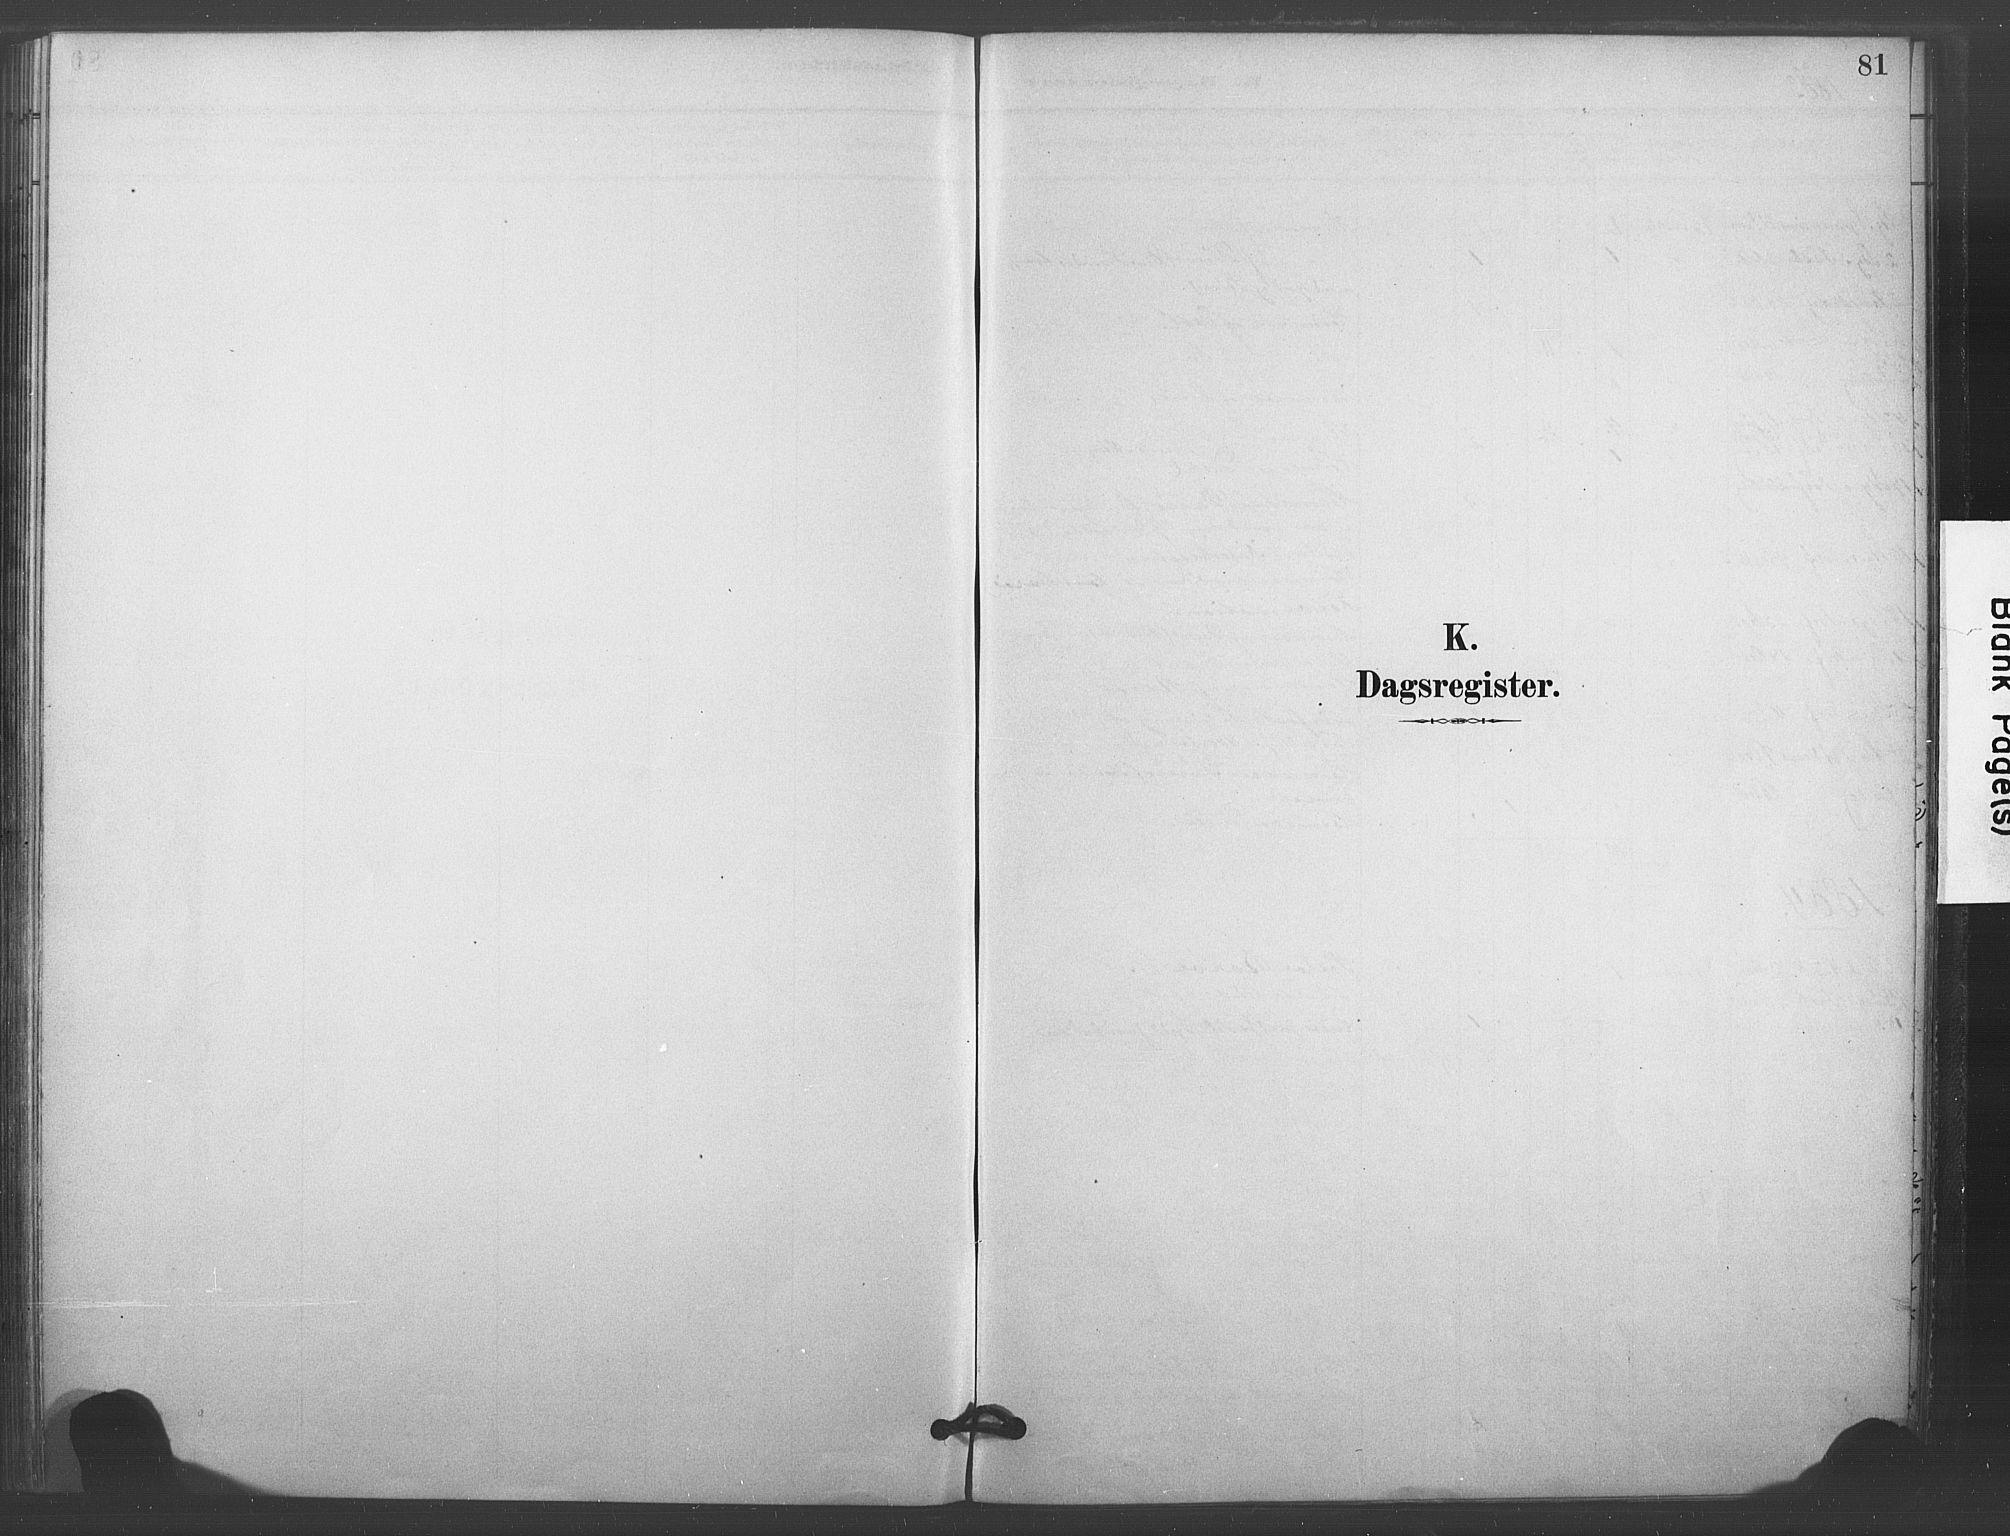 SAKO, Kongsberg kirkebøker, F/Fc/L0001: Ministerialbok nr. III 1, 1883-1897, s. 81